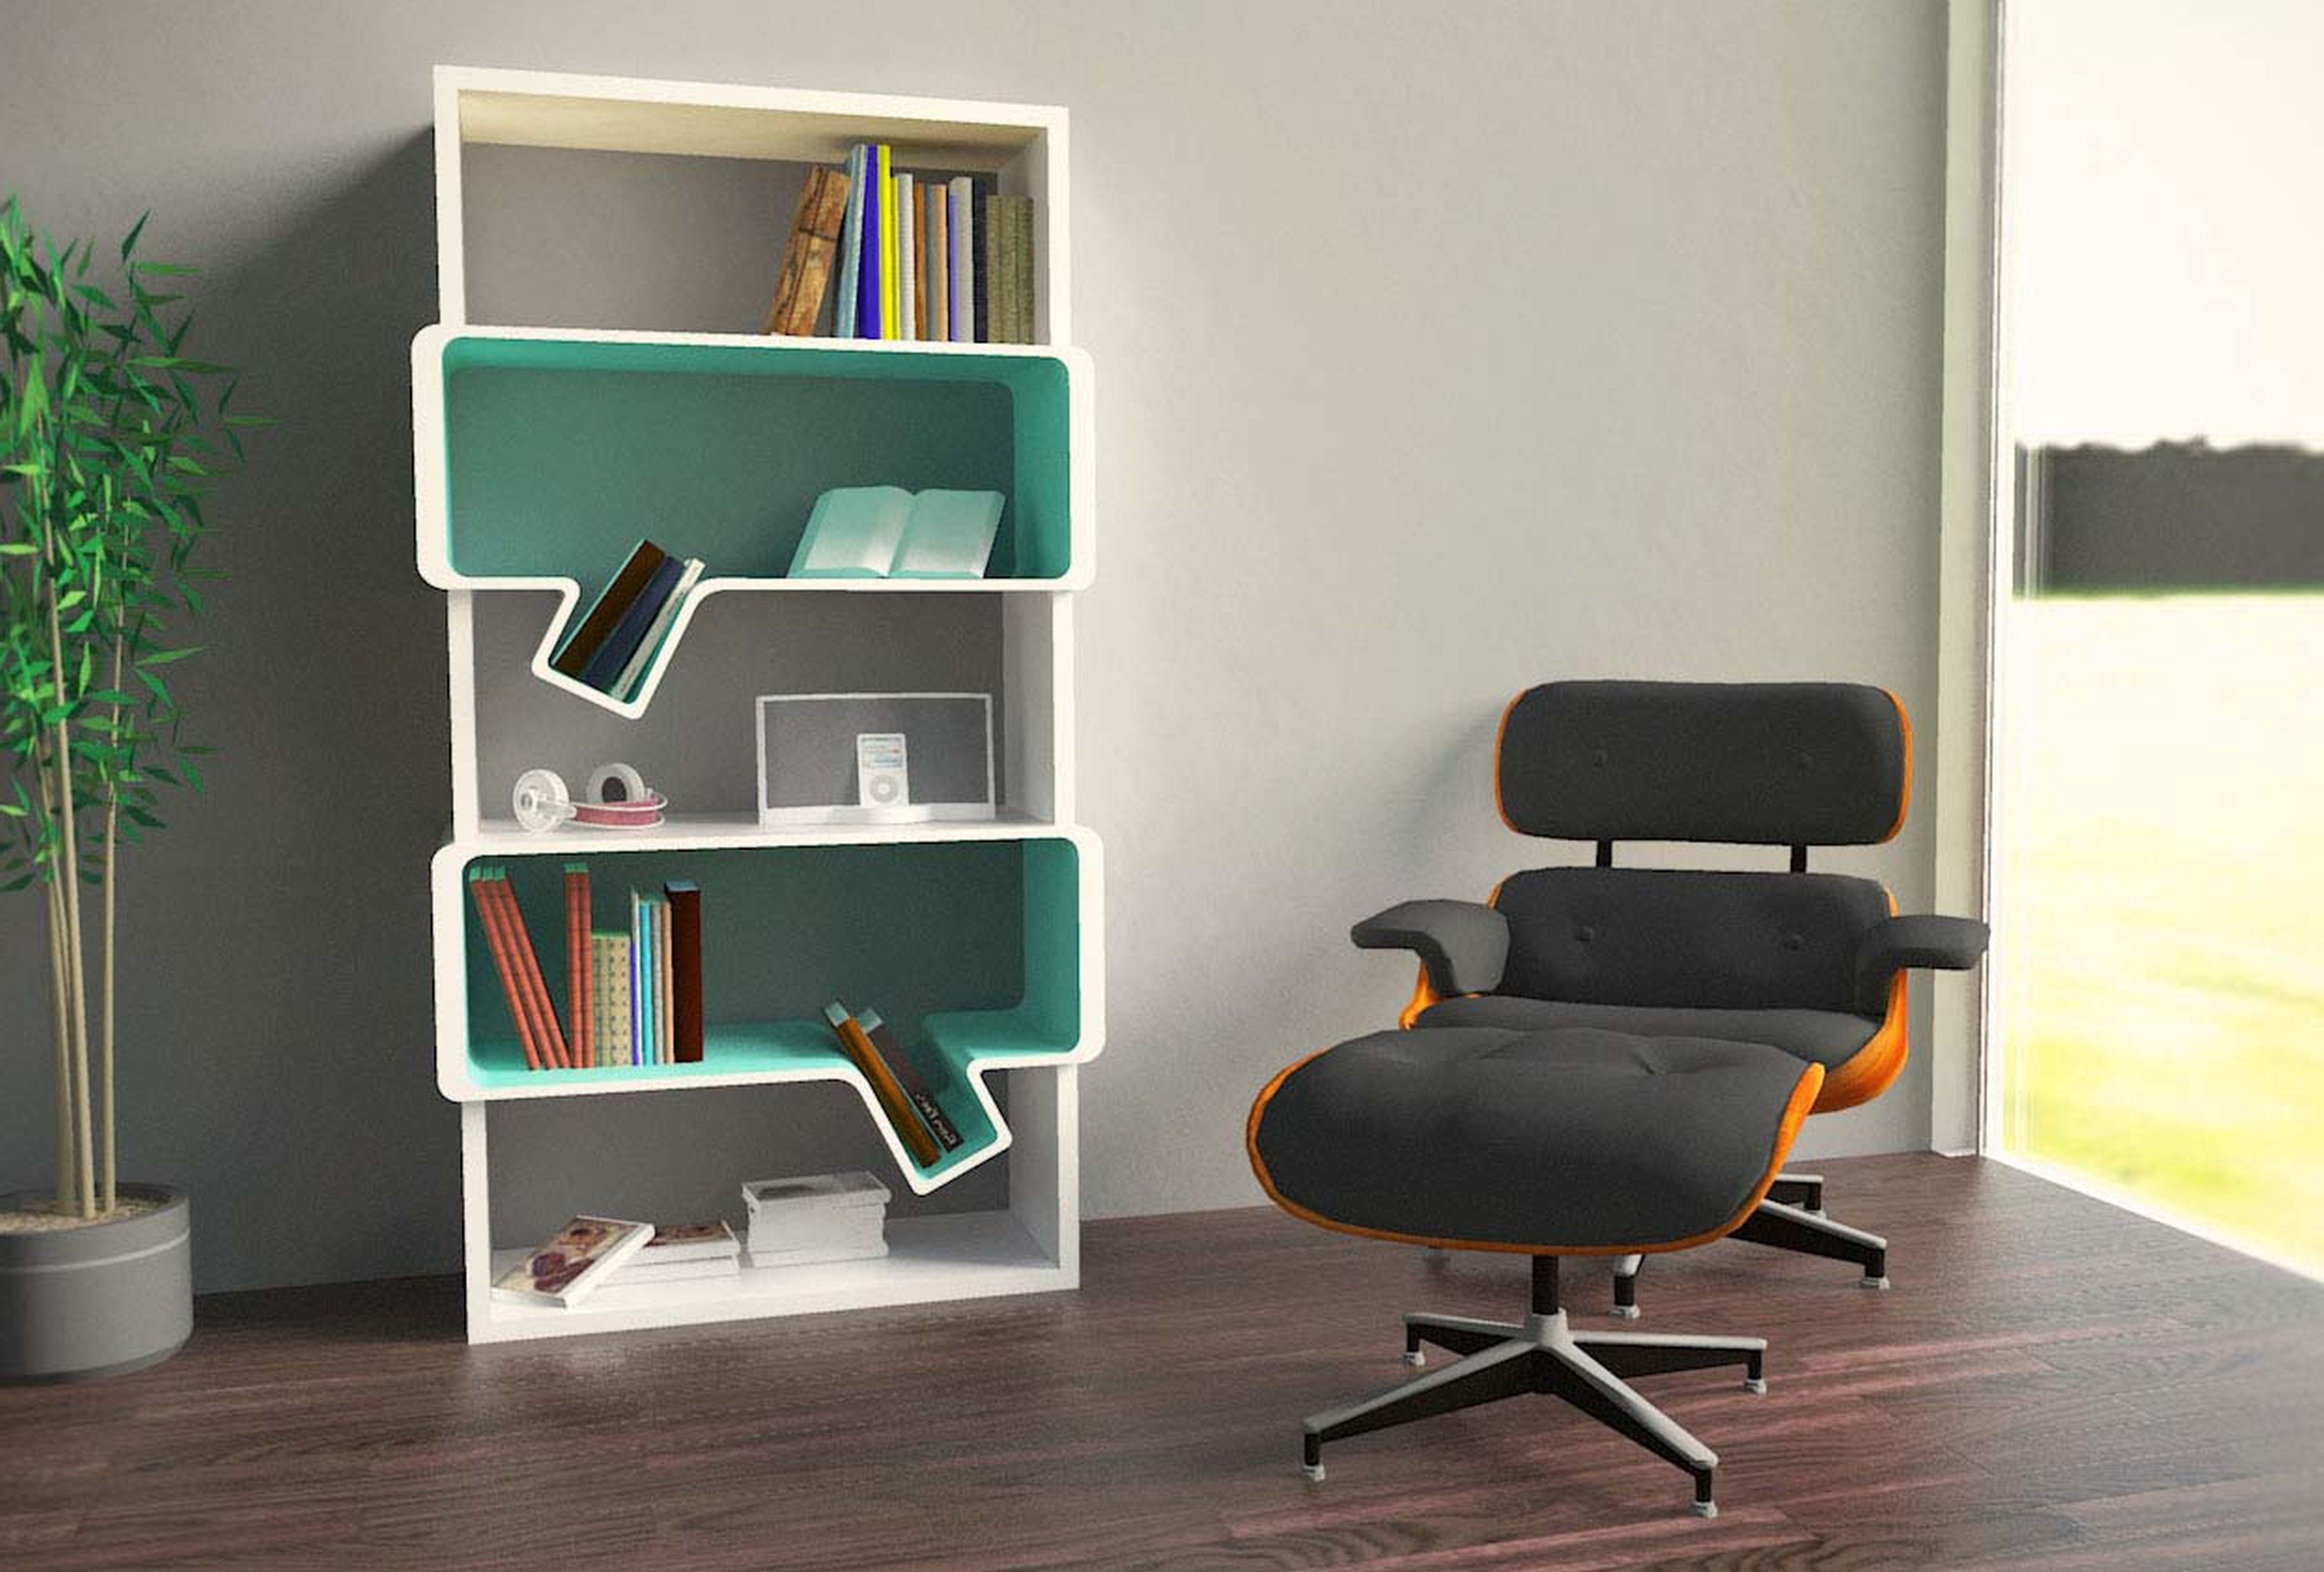 Bookshelf Design Ideasshoisecom Full Size Of Furniturebookshelves Within Design A Bookcase (#10 of 15)